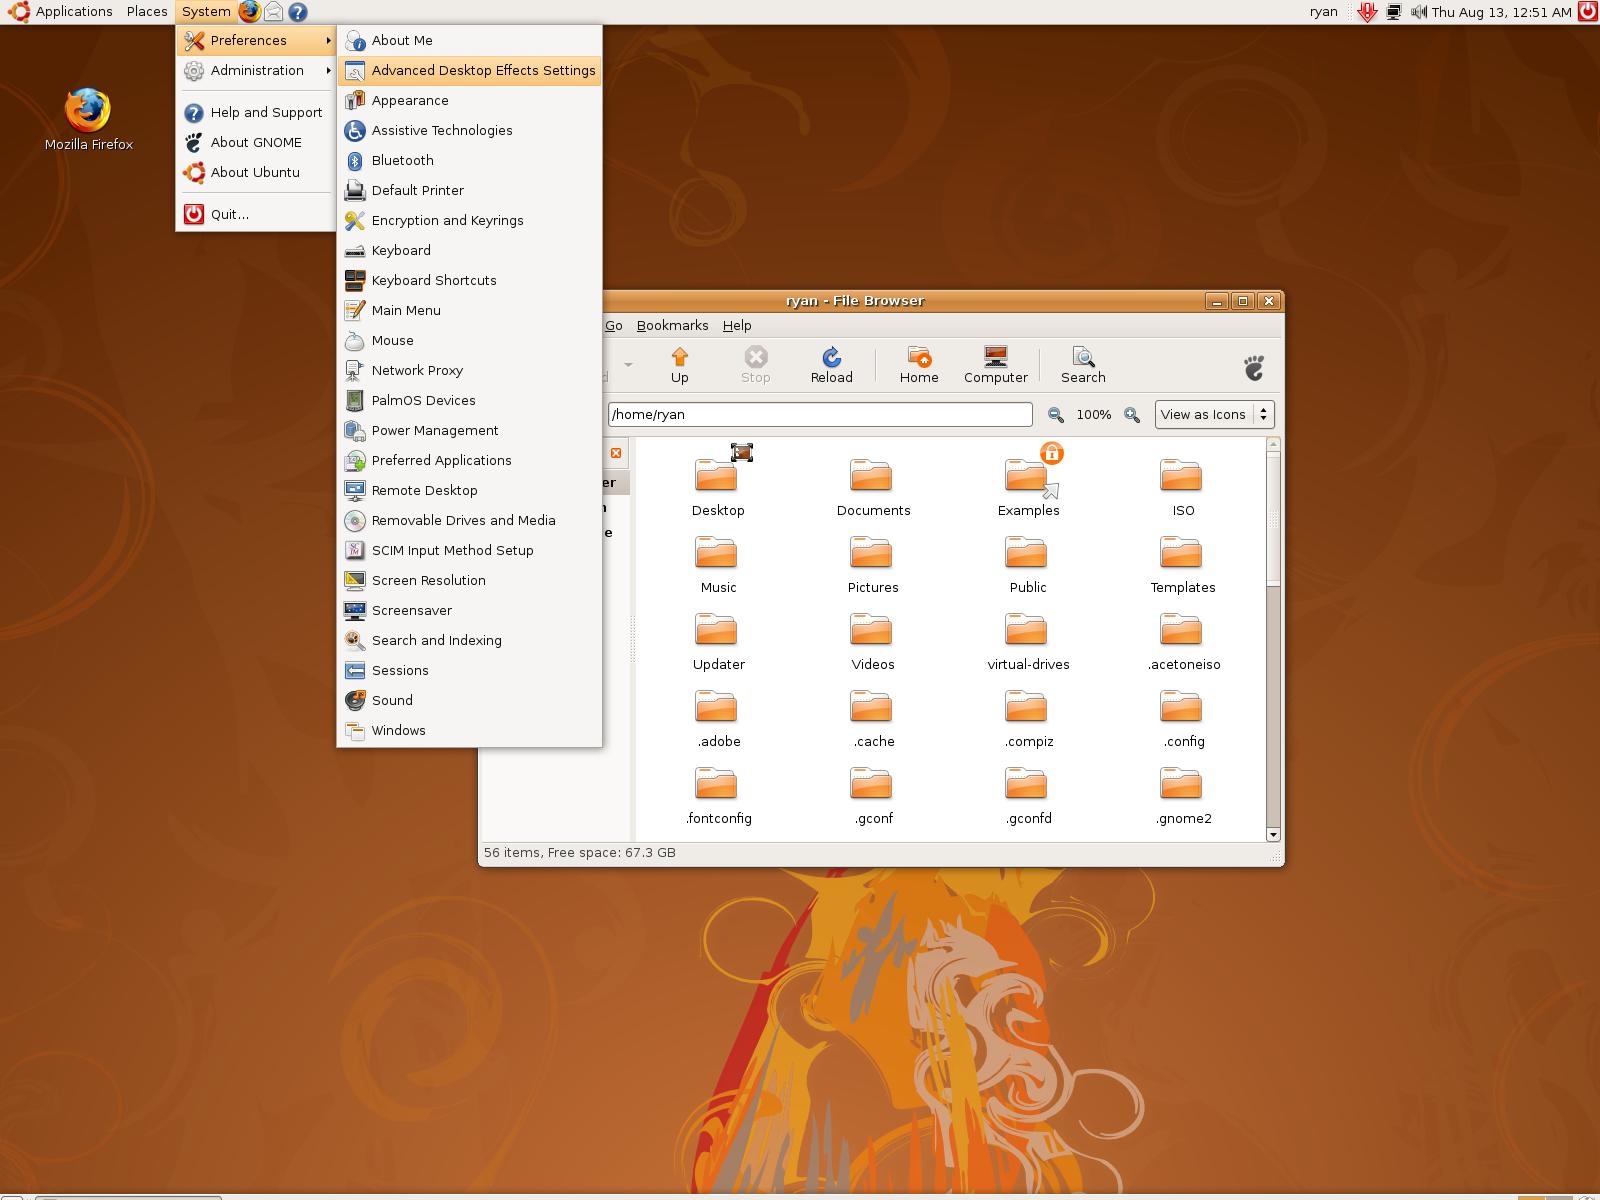 UI & Usability - Revisiting Linux Part 1: A Look at Ubuntu 8 04